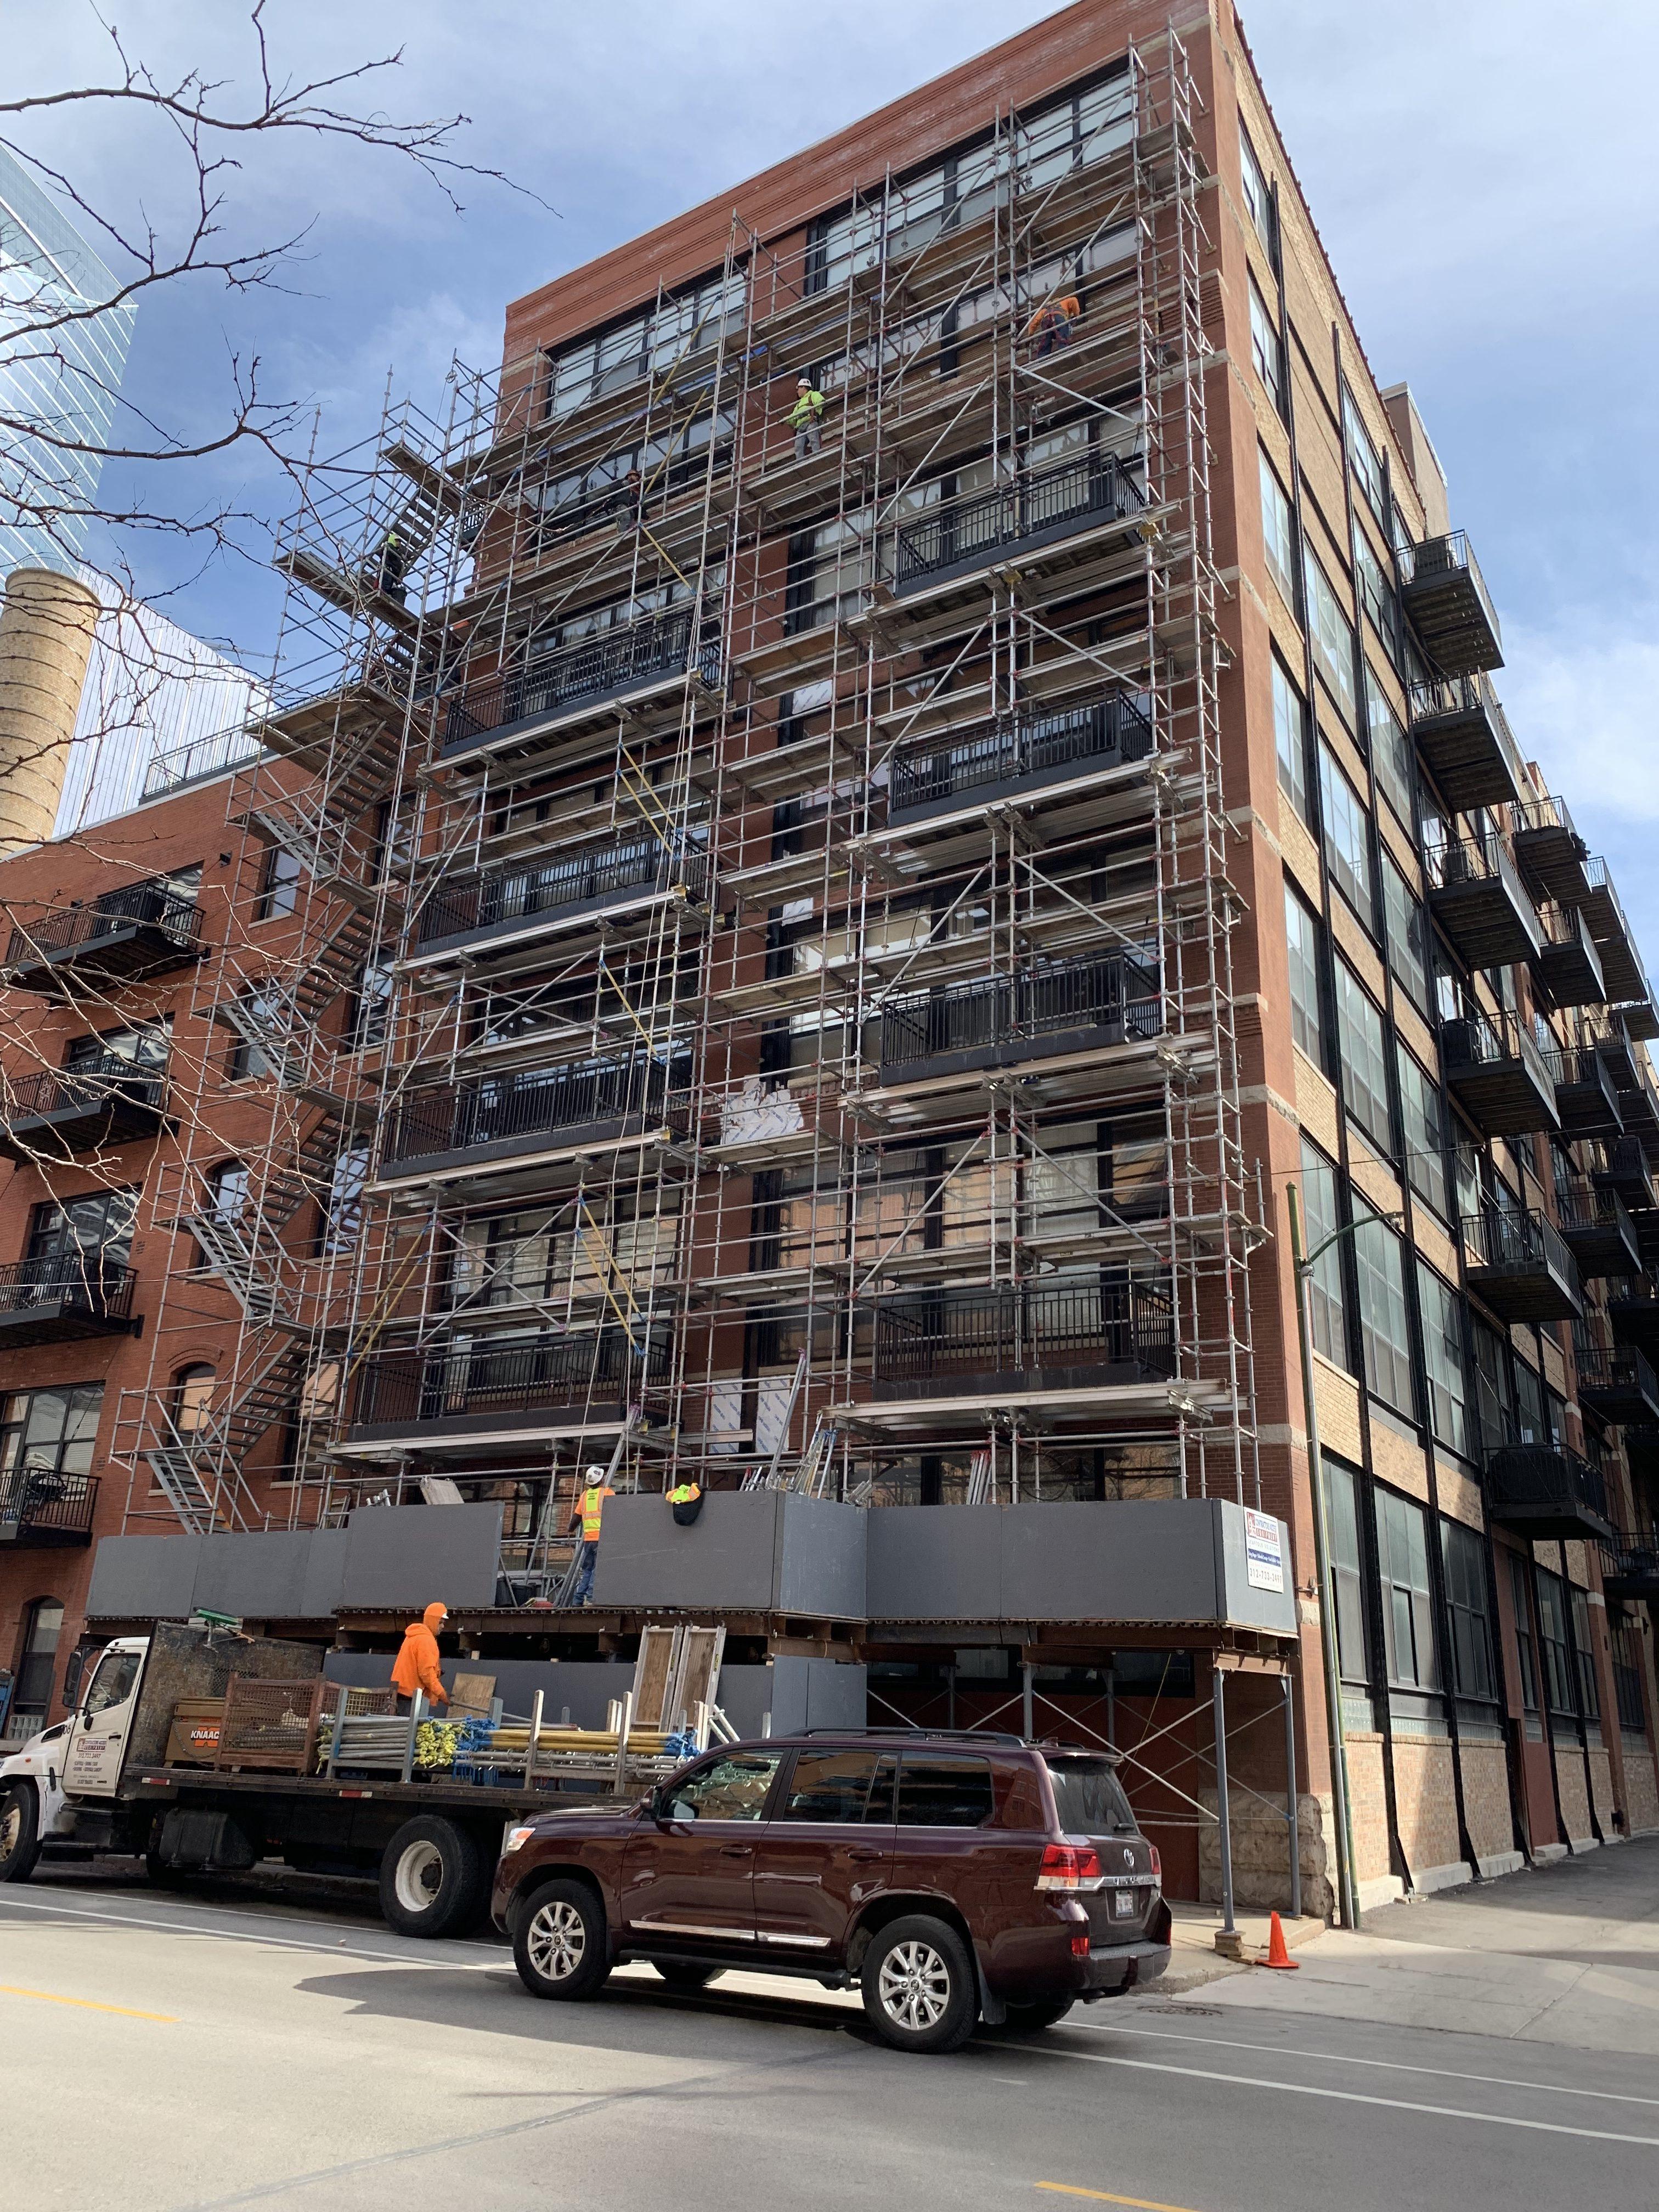 541 W. Fulton - Shoring & Tower scaffold 6